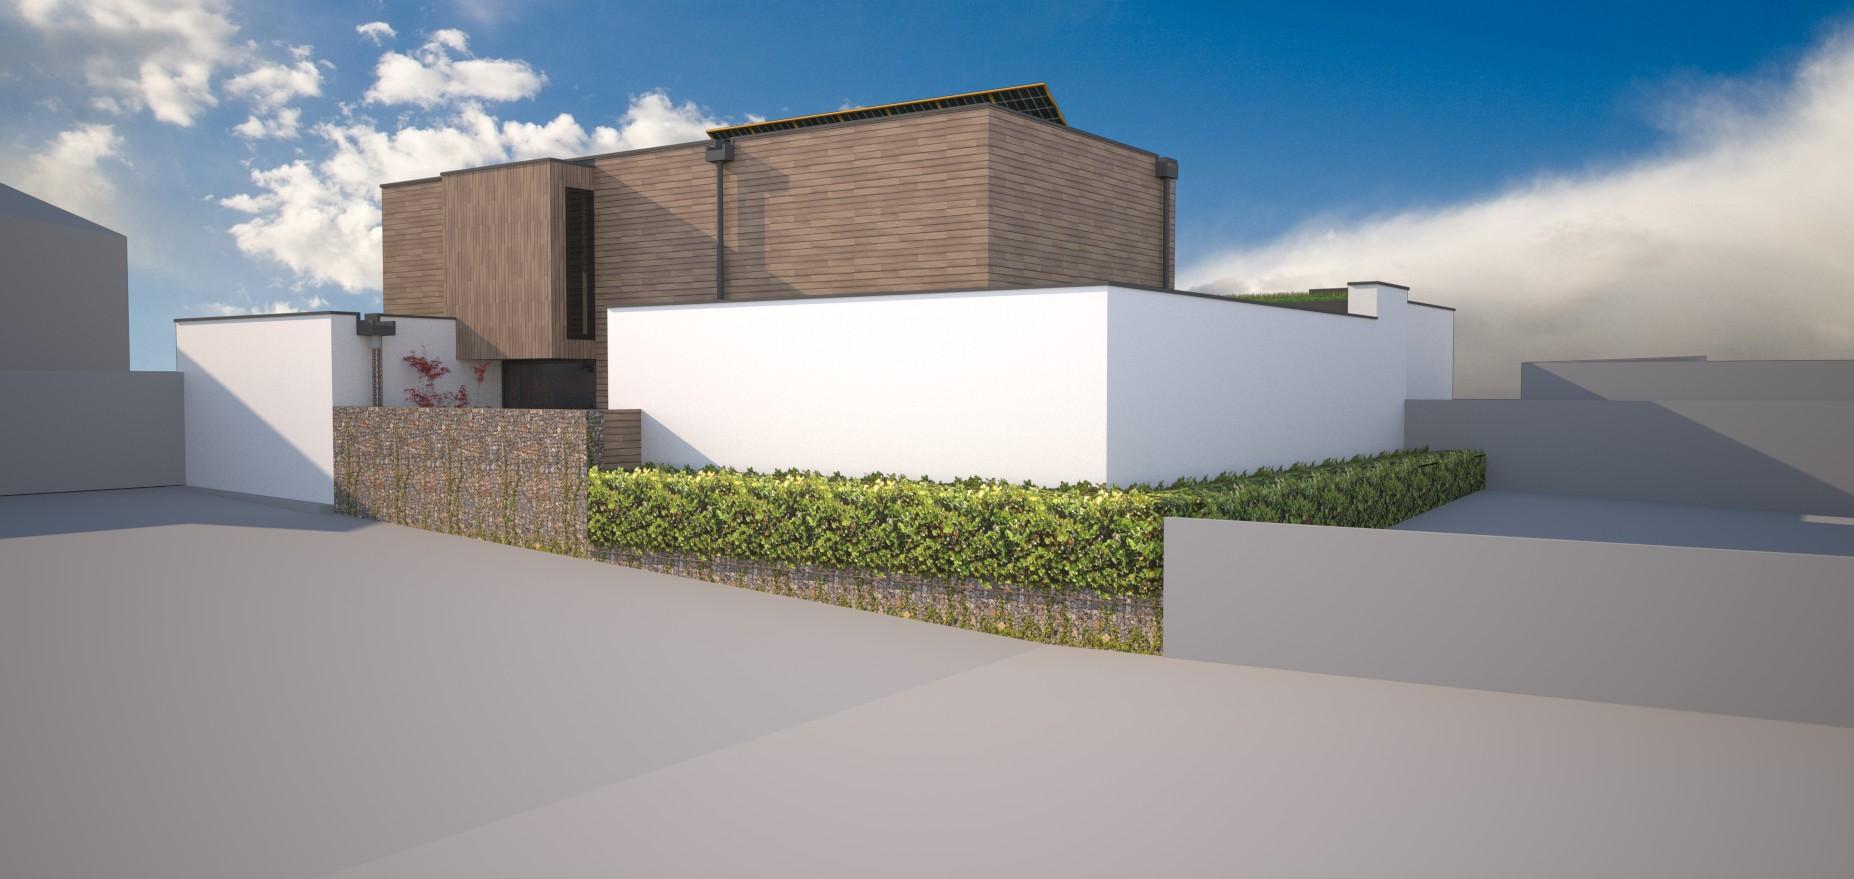 Courtyard-house-streetView2